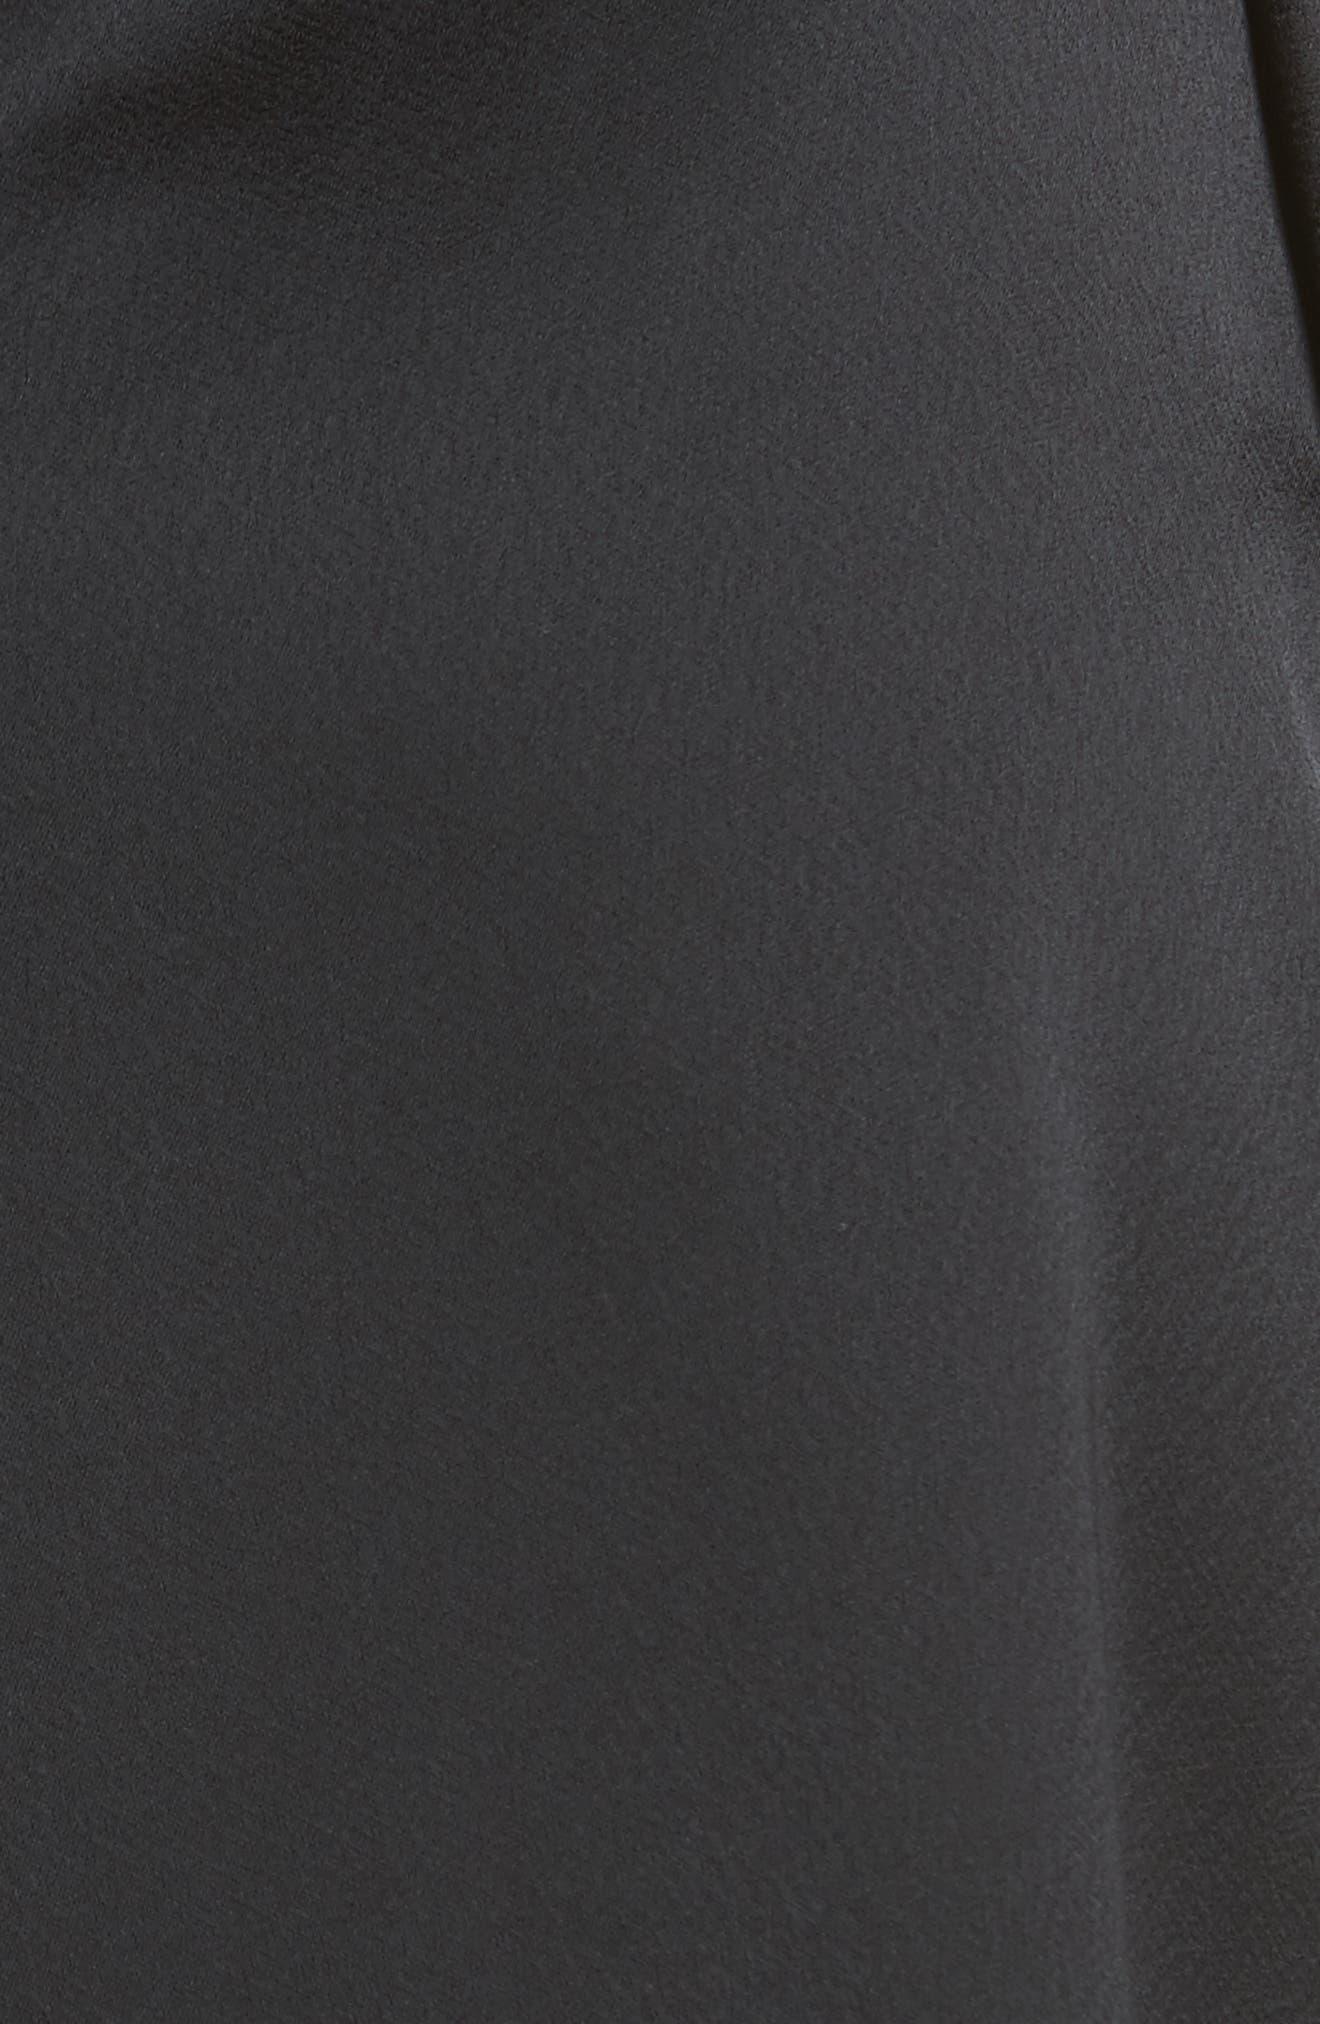 Asymmetric Satin Dress,                             Alternate thumbnail 5, color,                             001